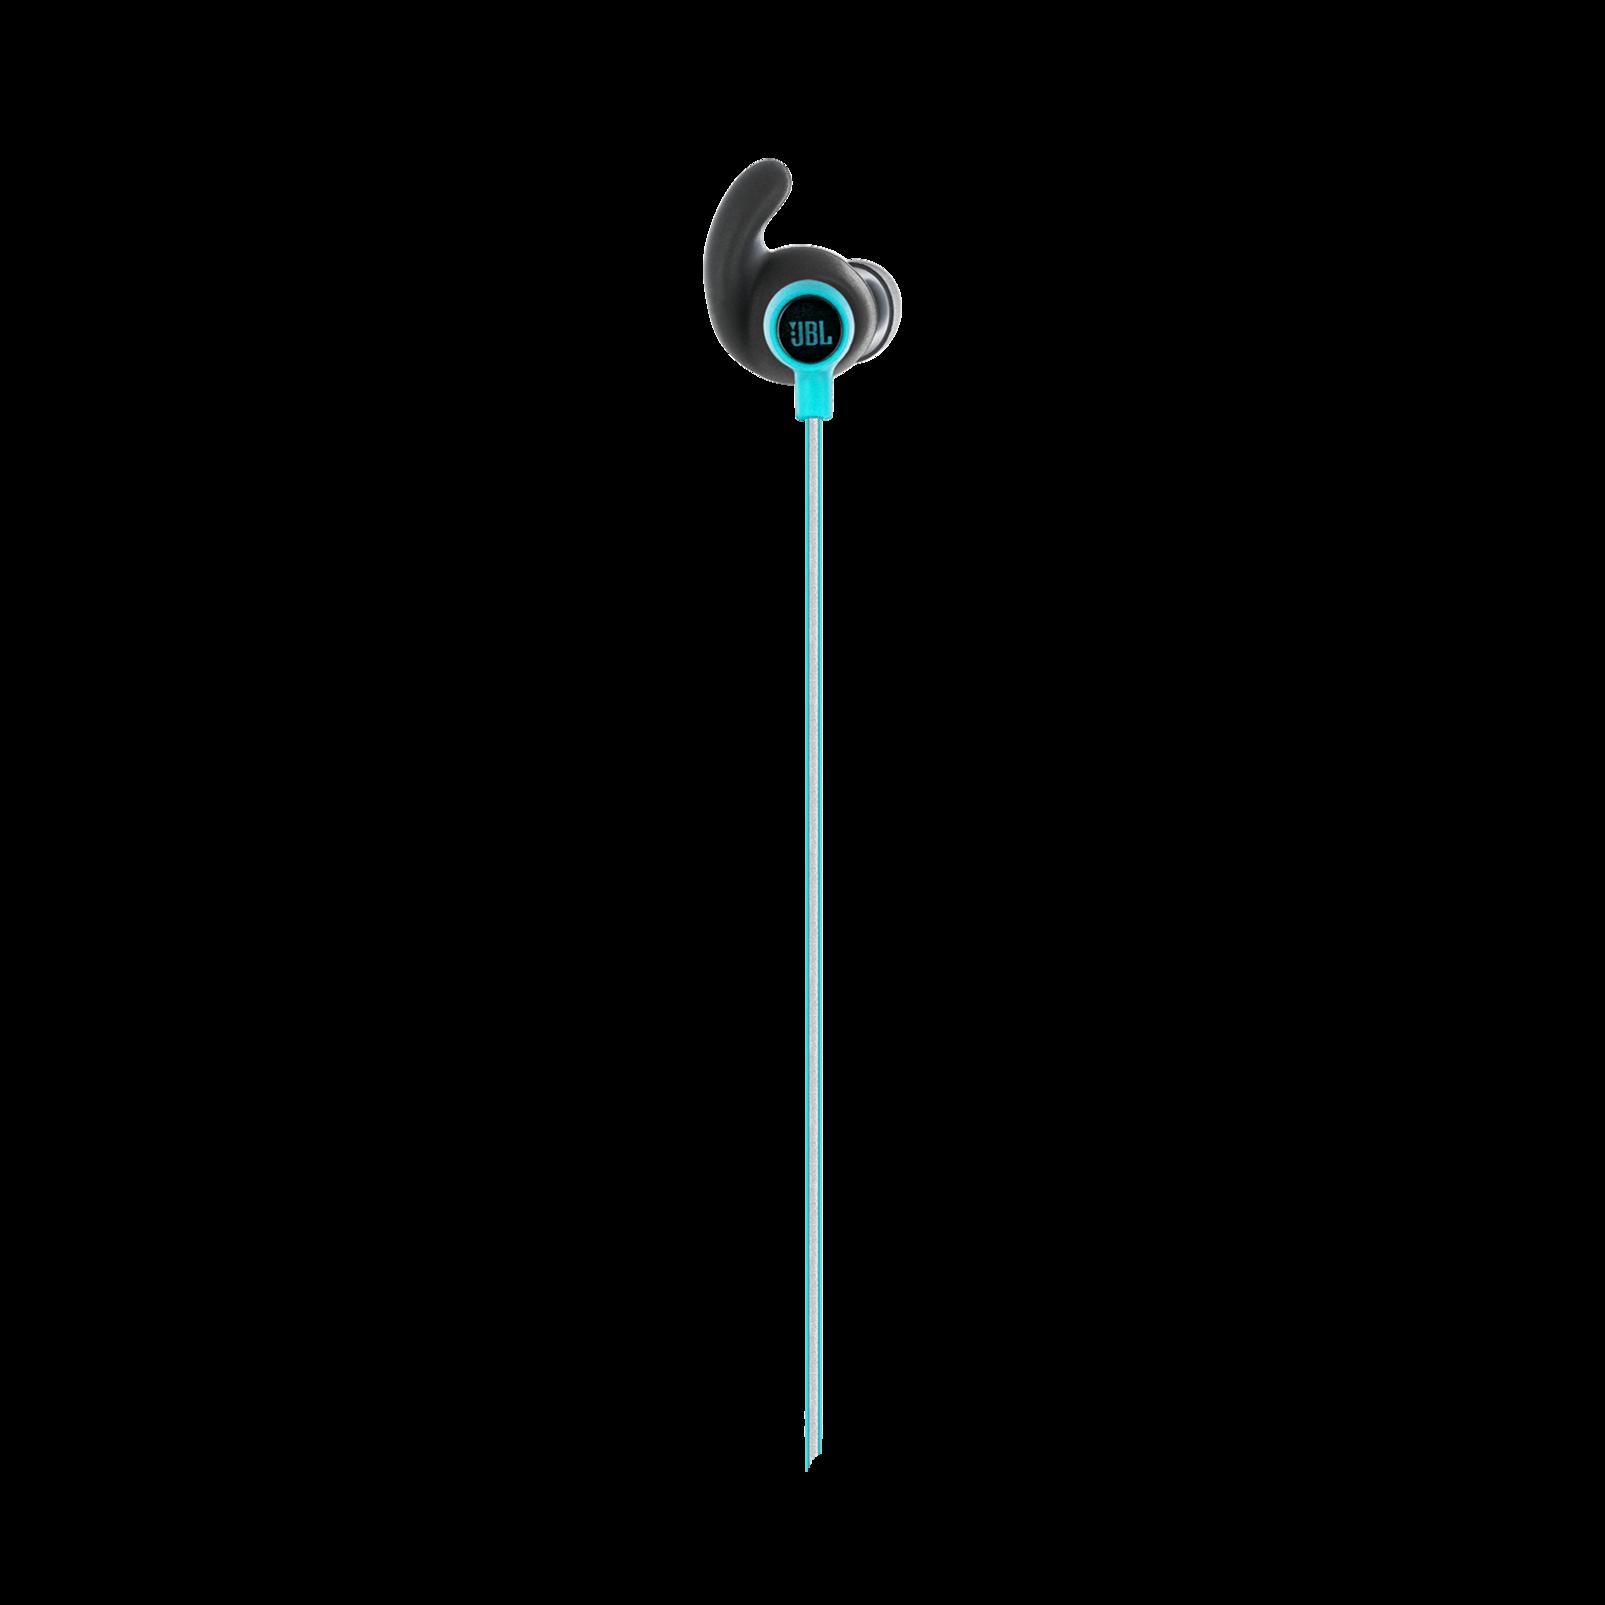 Reflect Mini - Teal - Lightweight, in-ear sport headphones - Detailshot 4